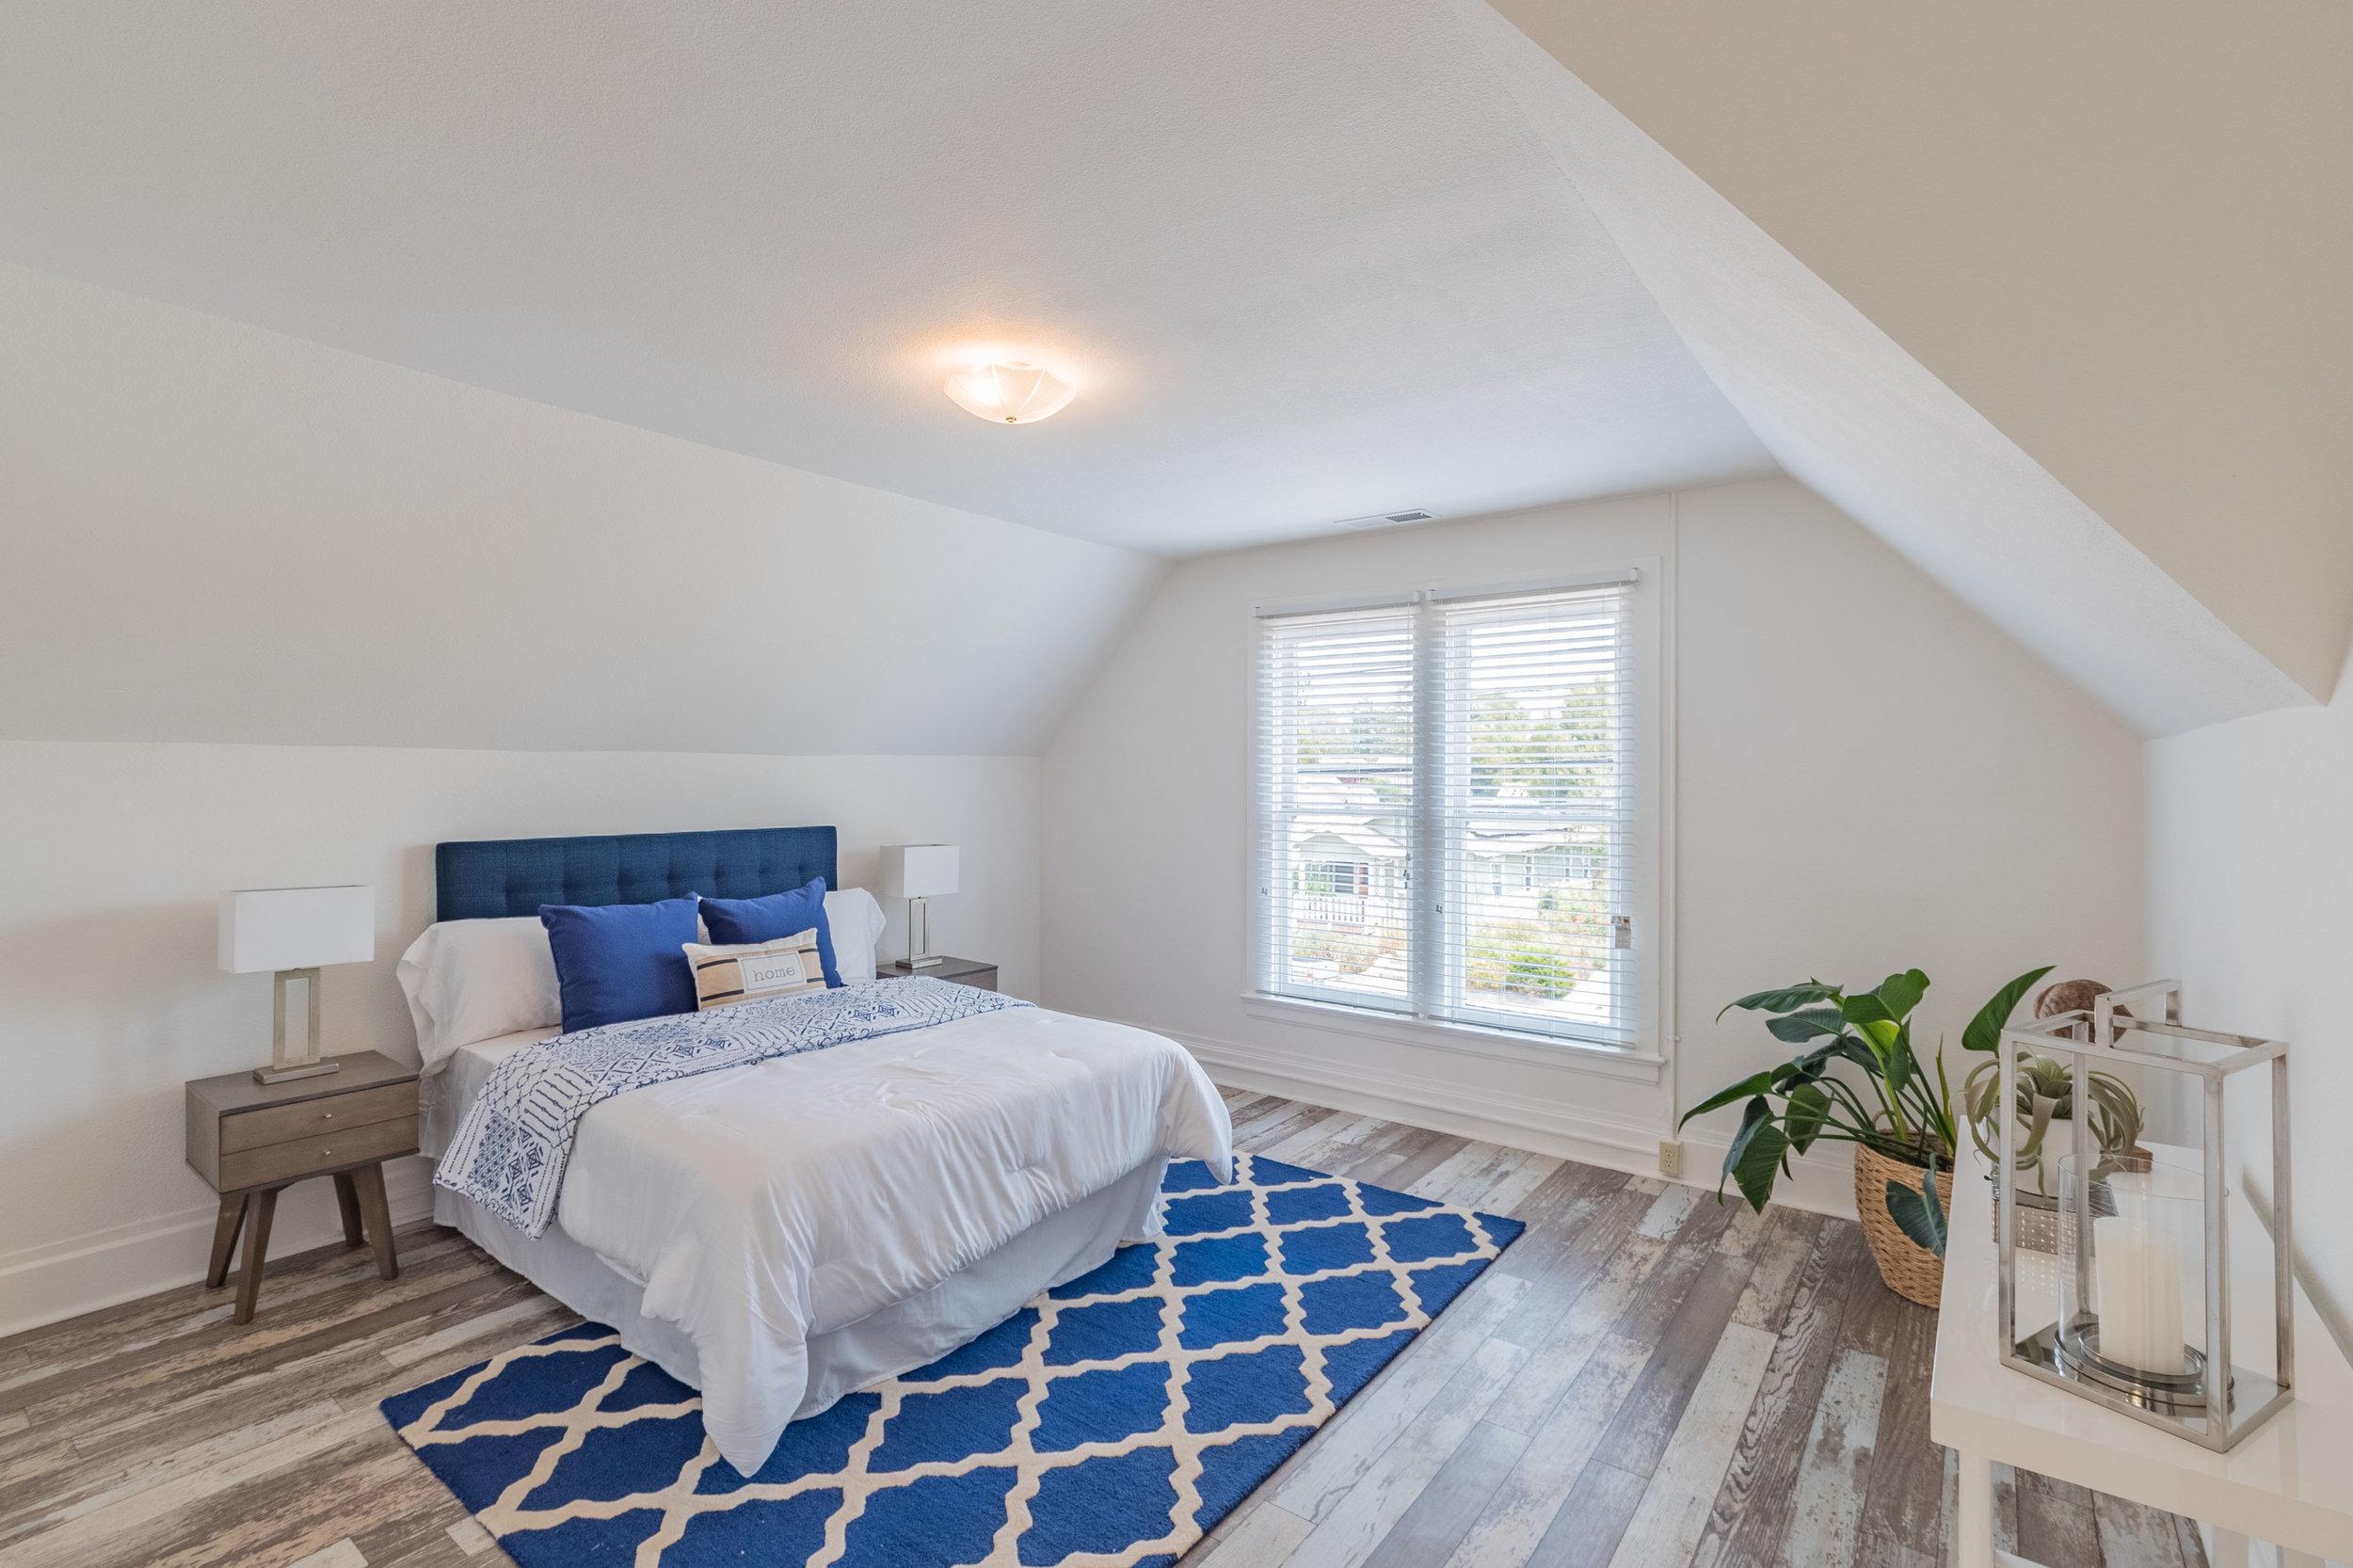 Houses for Sale in Santa Cruz.jpg